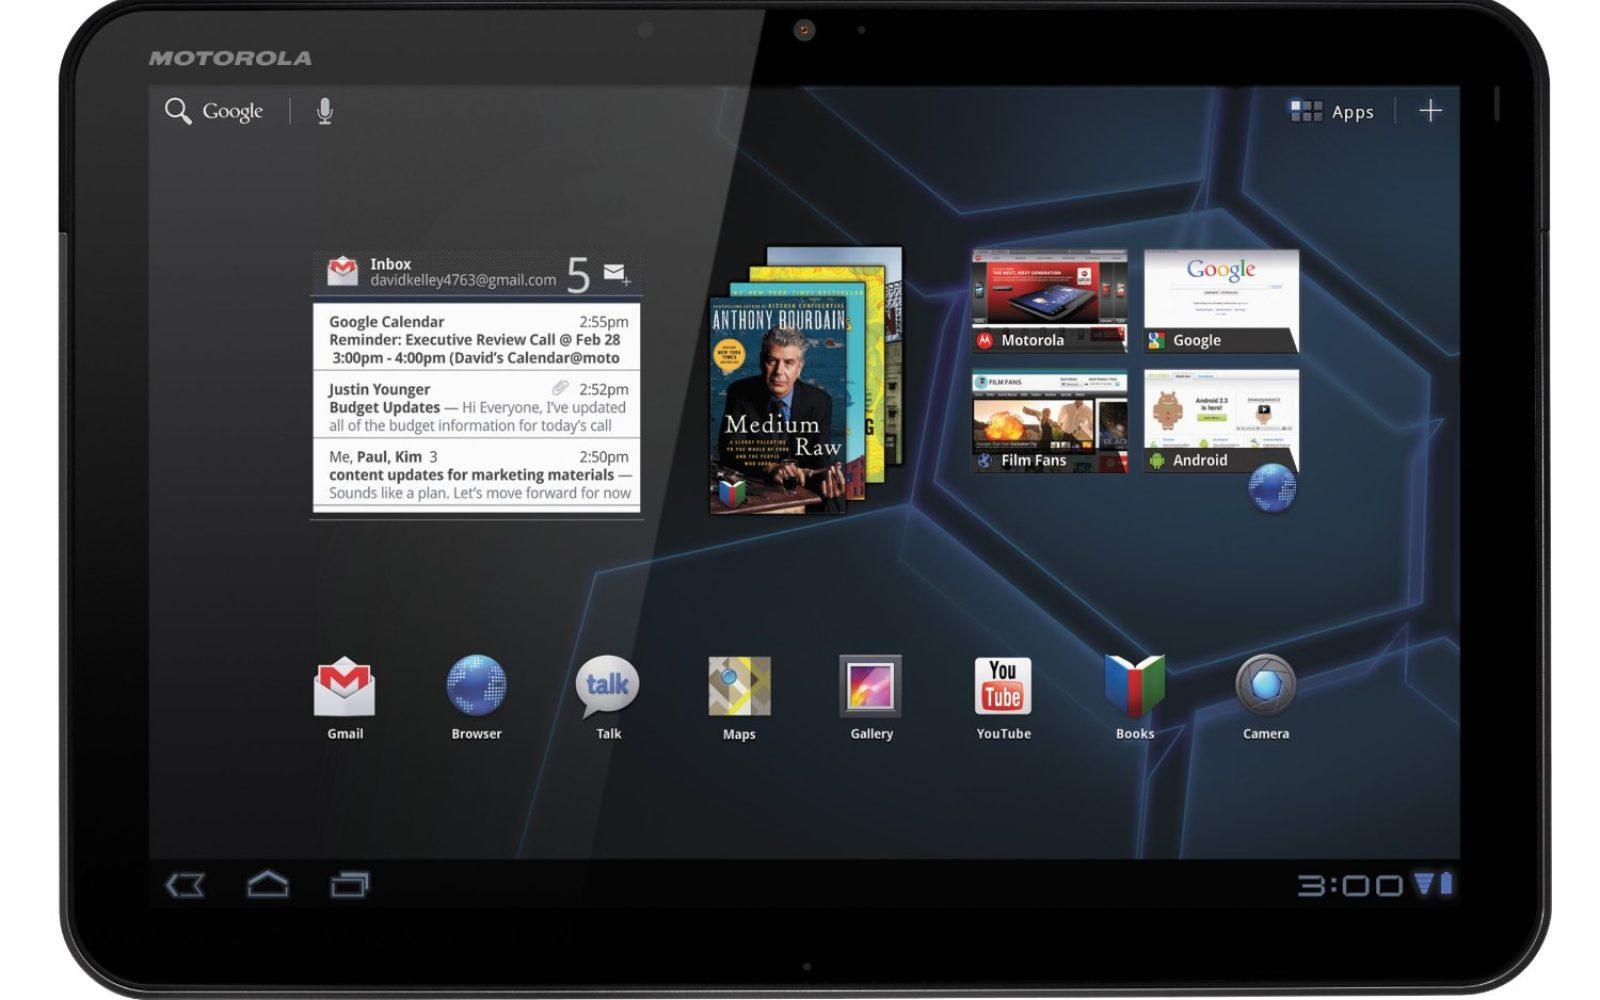 ITC import ban on Motorola Android devices kicks in tomorrow